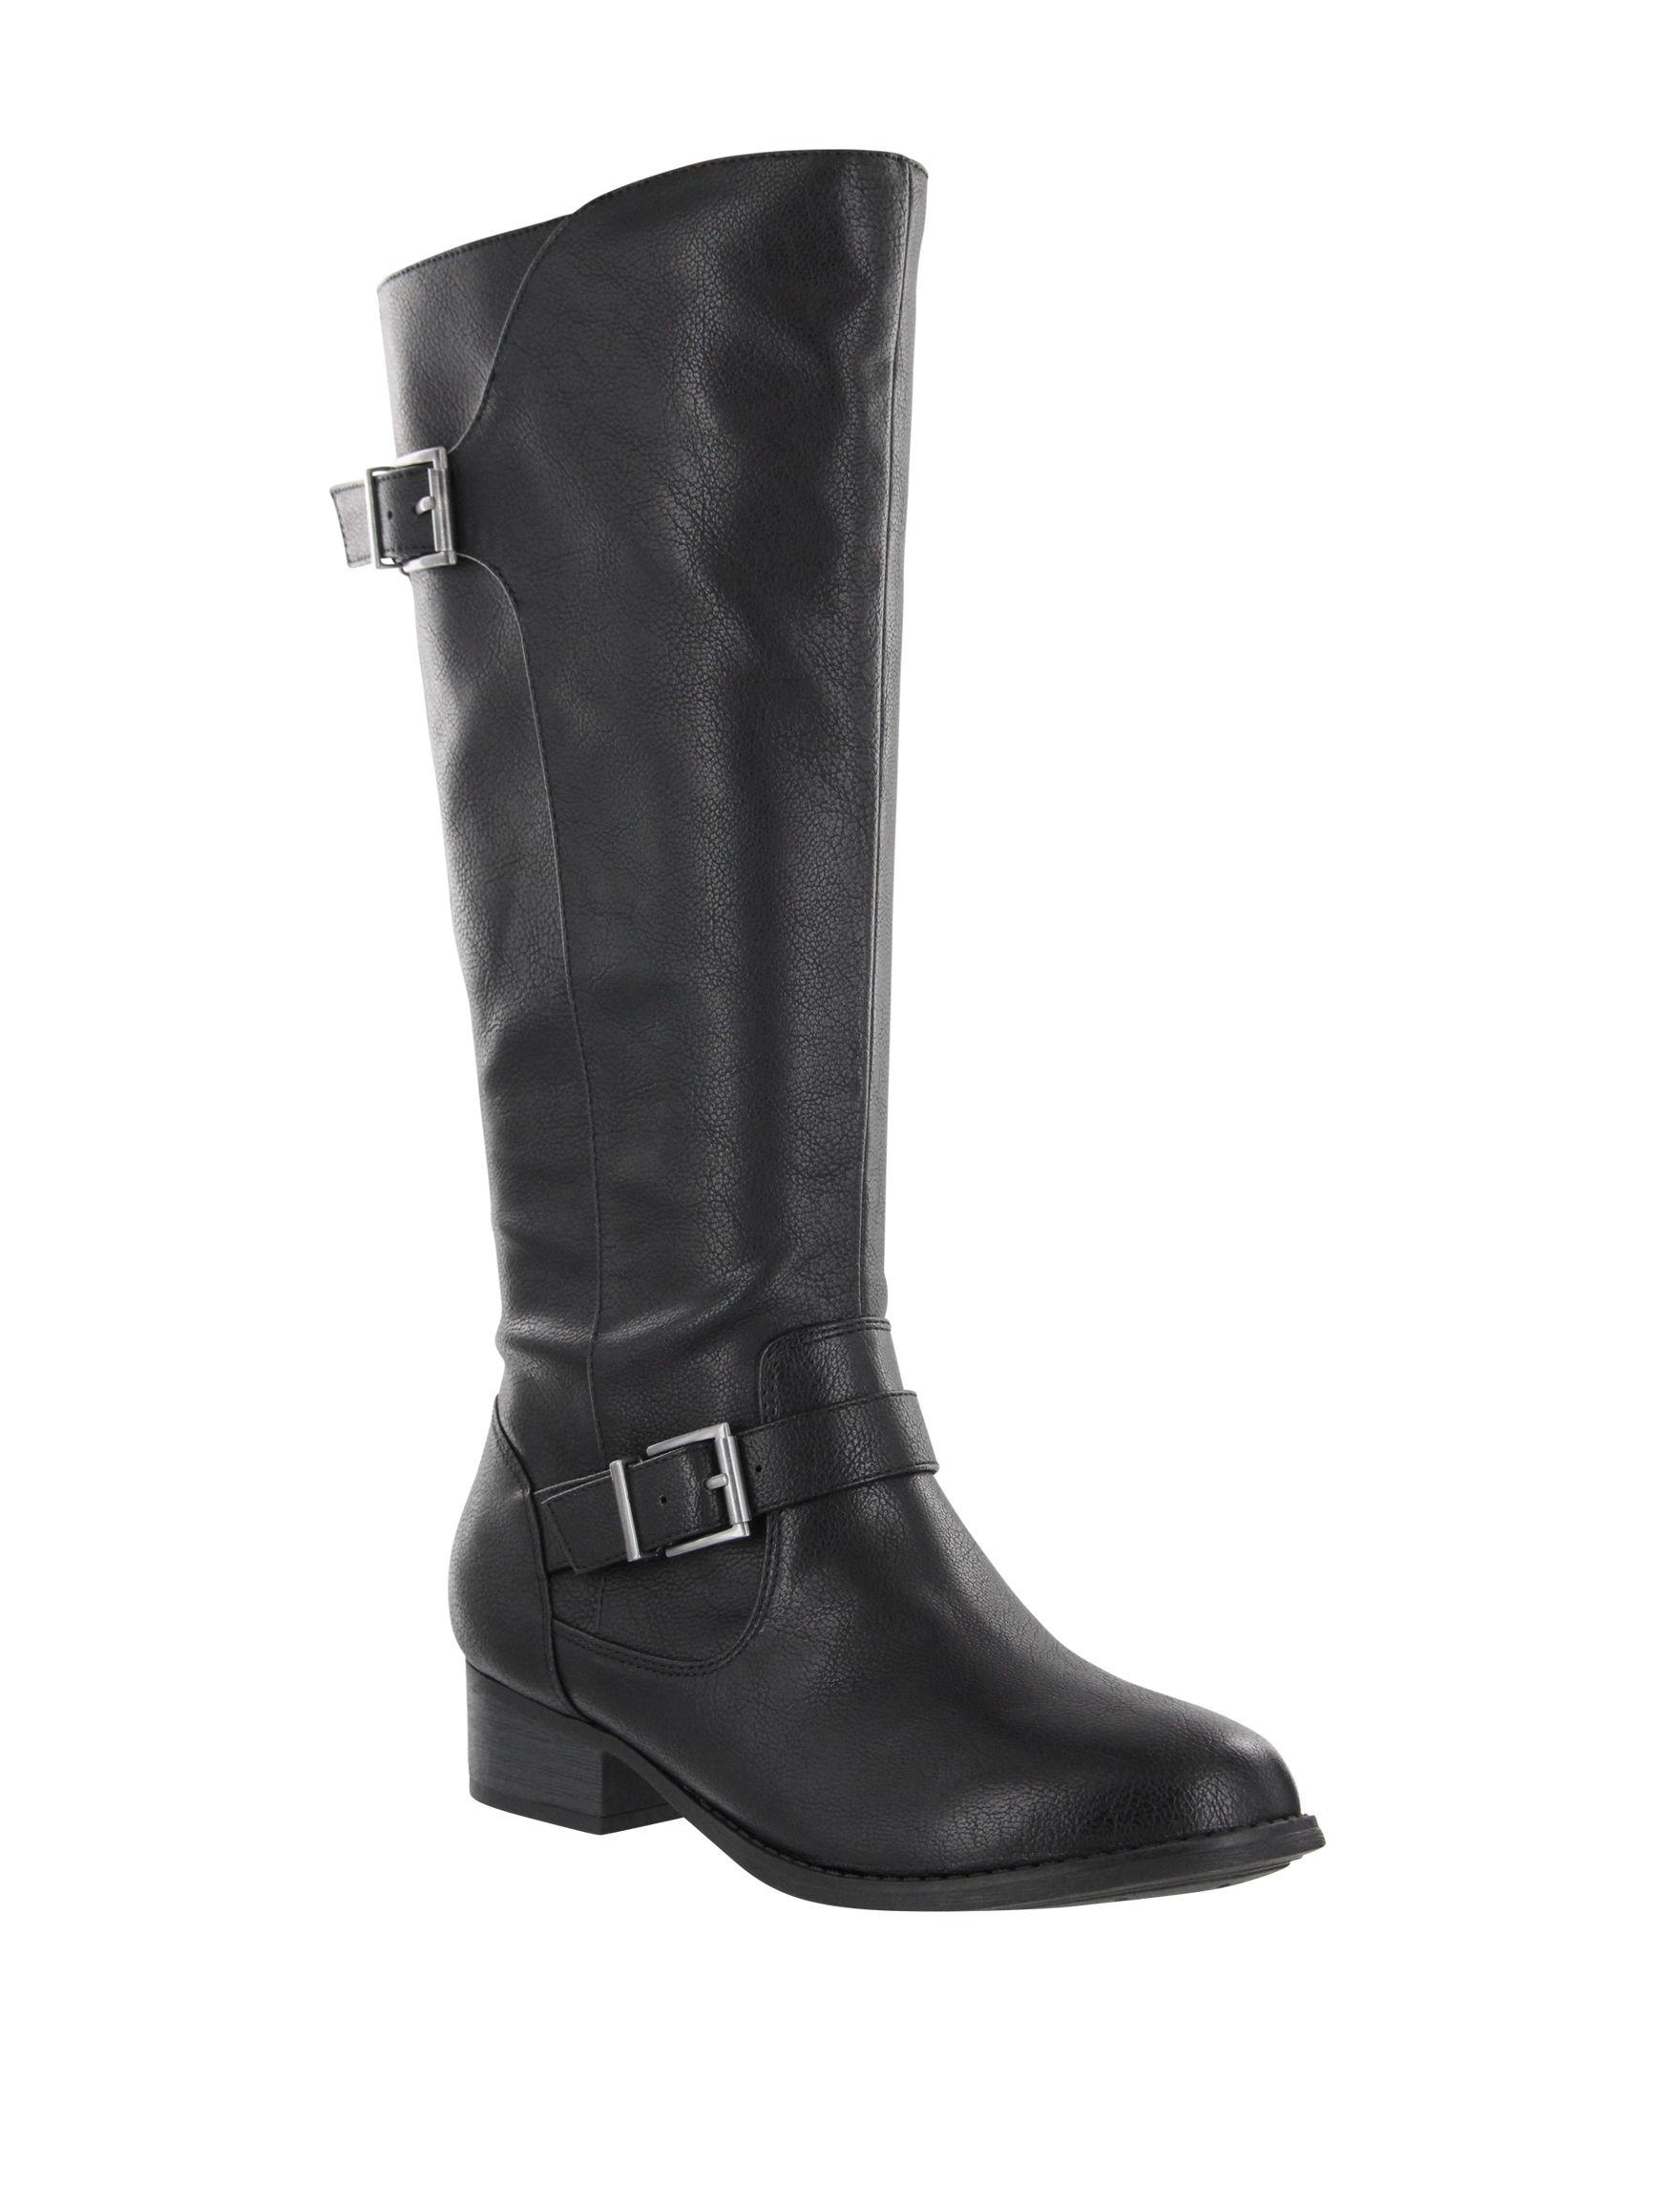 MIA Black Riding Boots